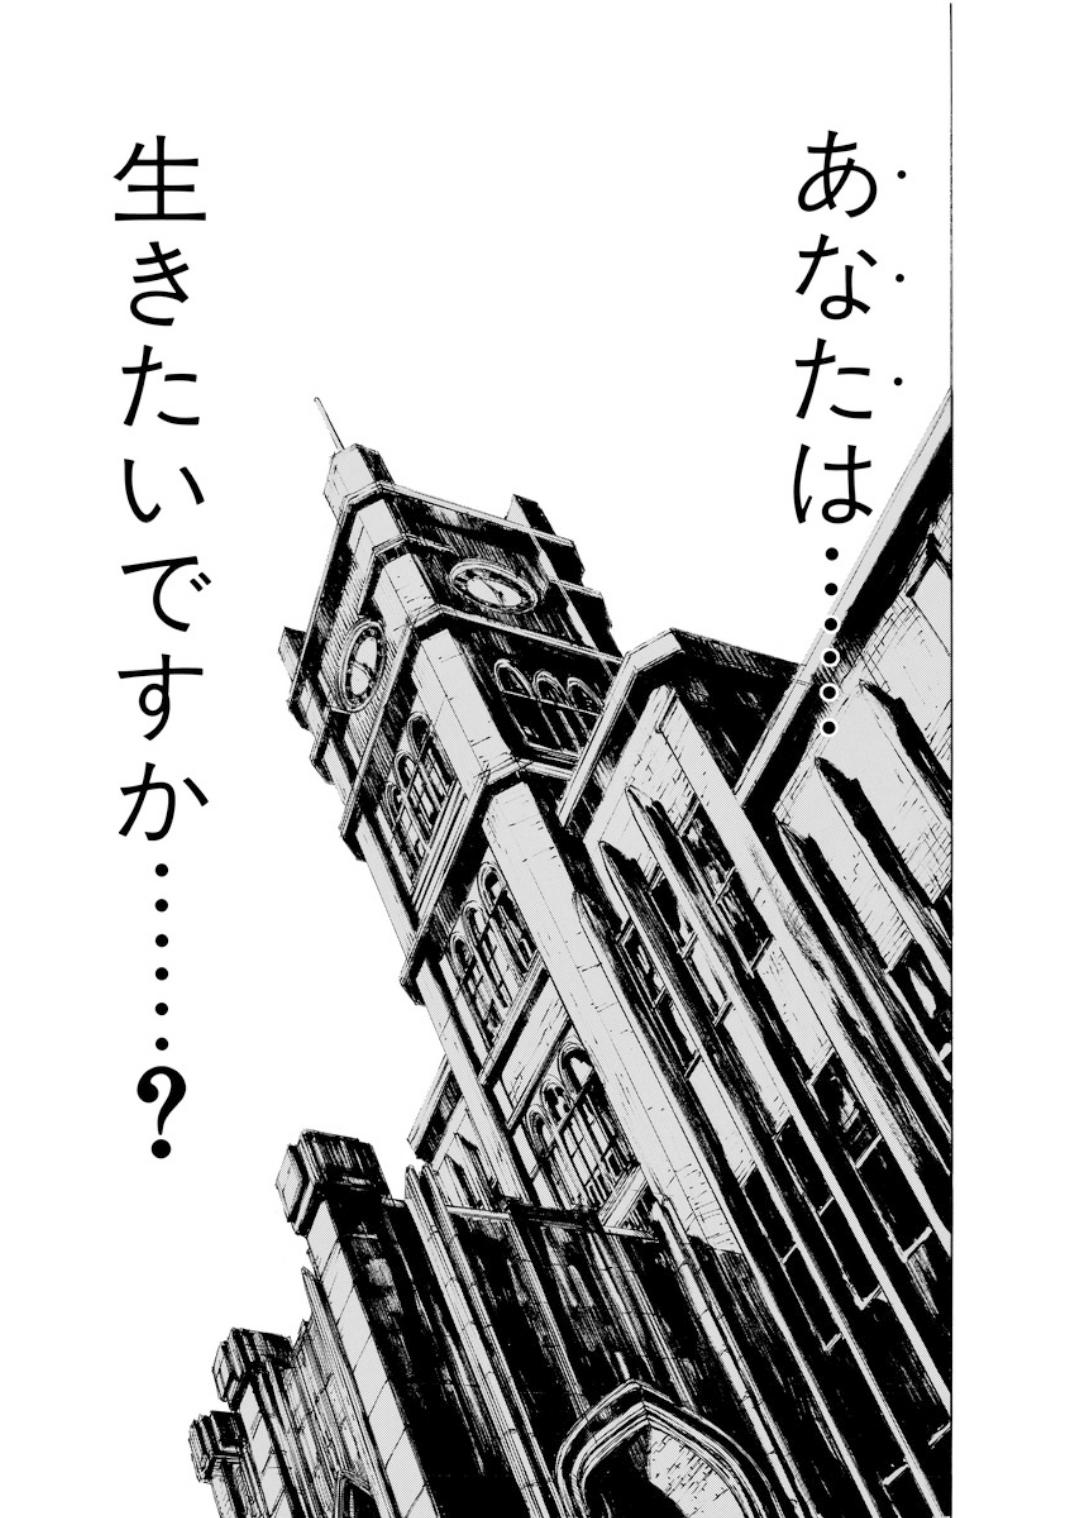 001bj_page-0105.jpg